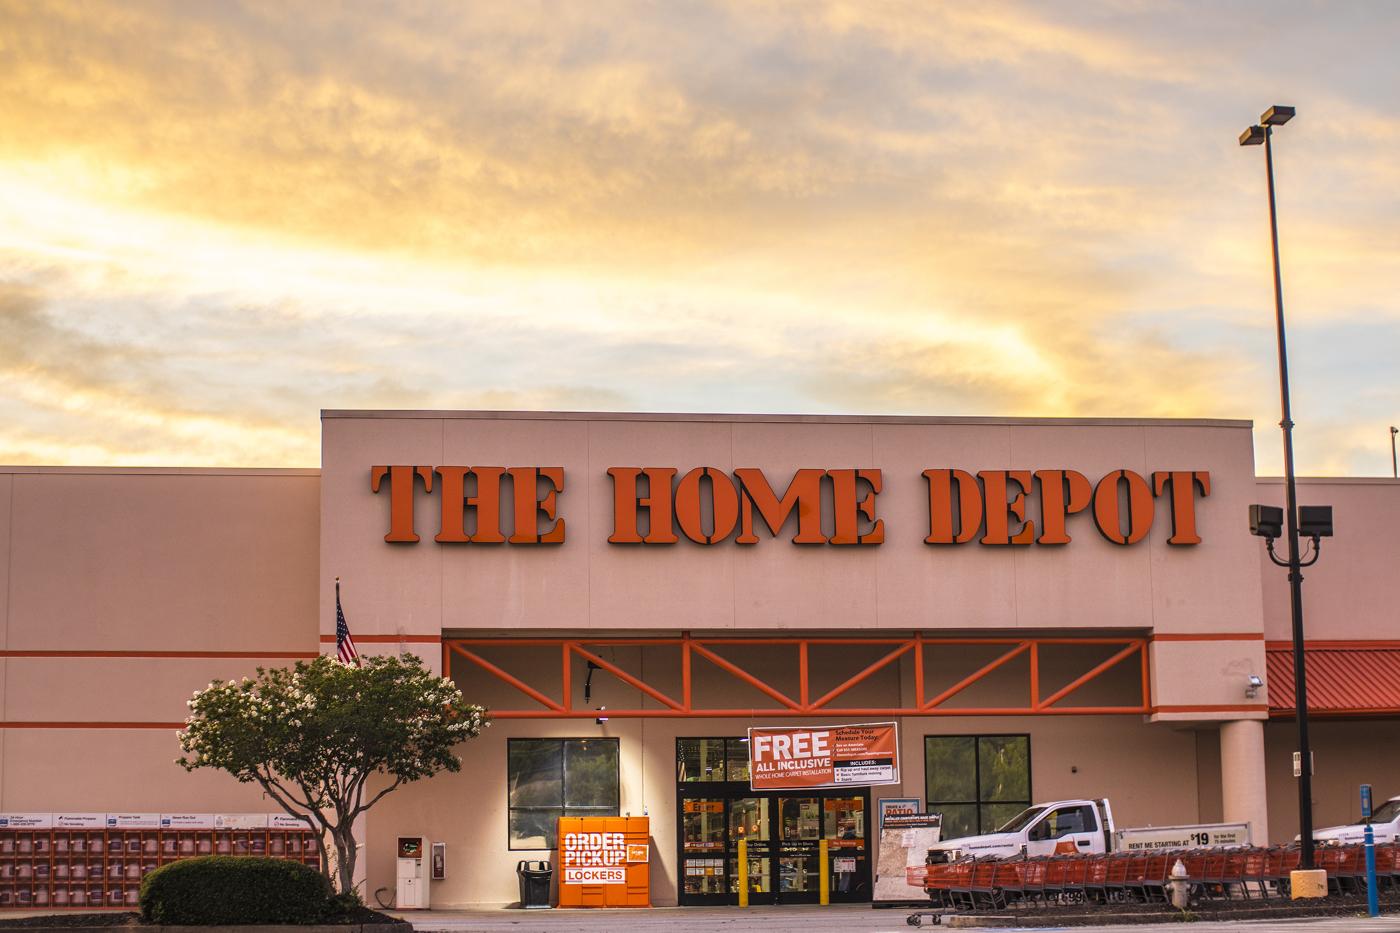 Home Depot stock, The Home Depot stock, HD stock